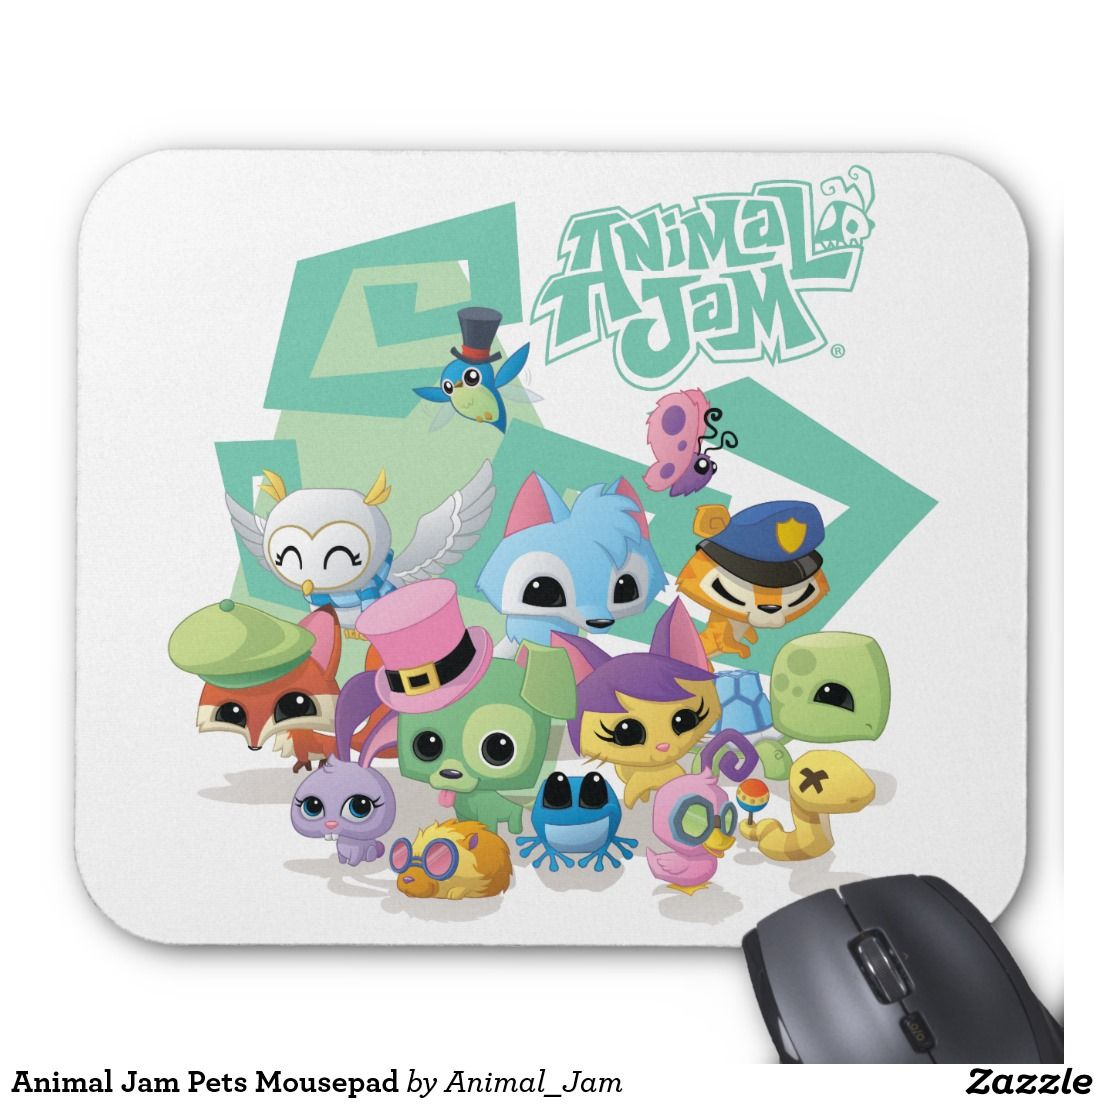 Animal Jam Pets Mousepad Animal jam, Pets